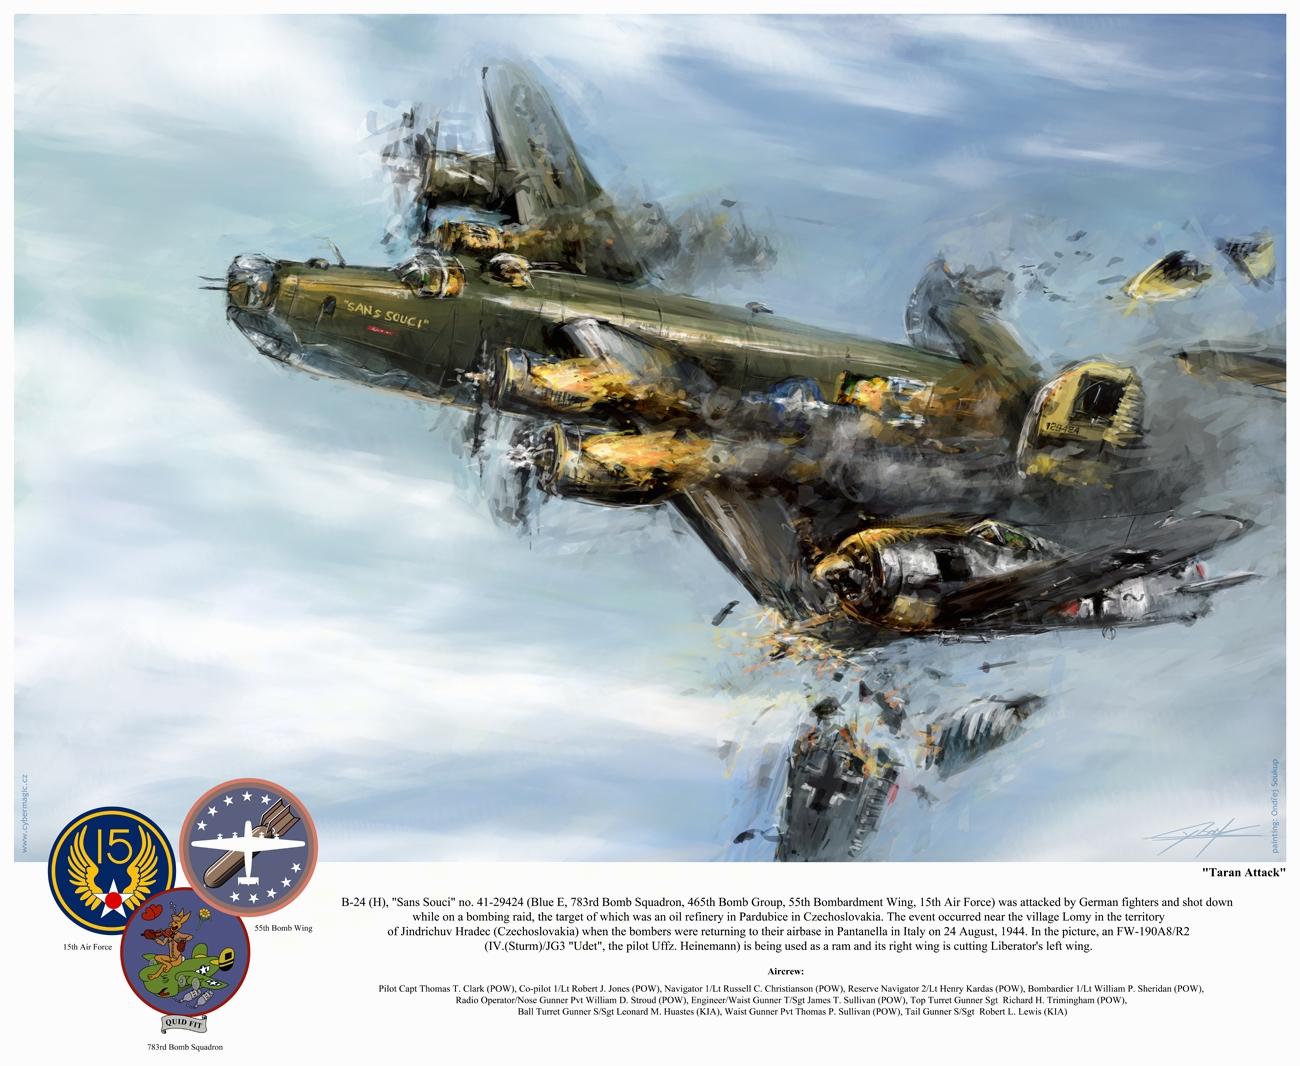 World War 2: B24 Sans Souci 'Taran attack' by VitoSs